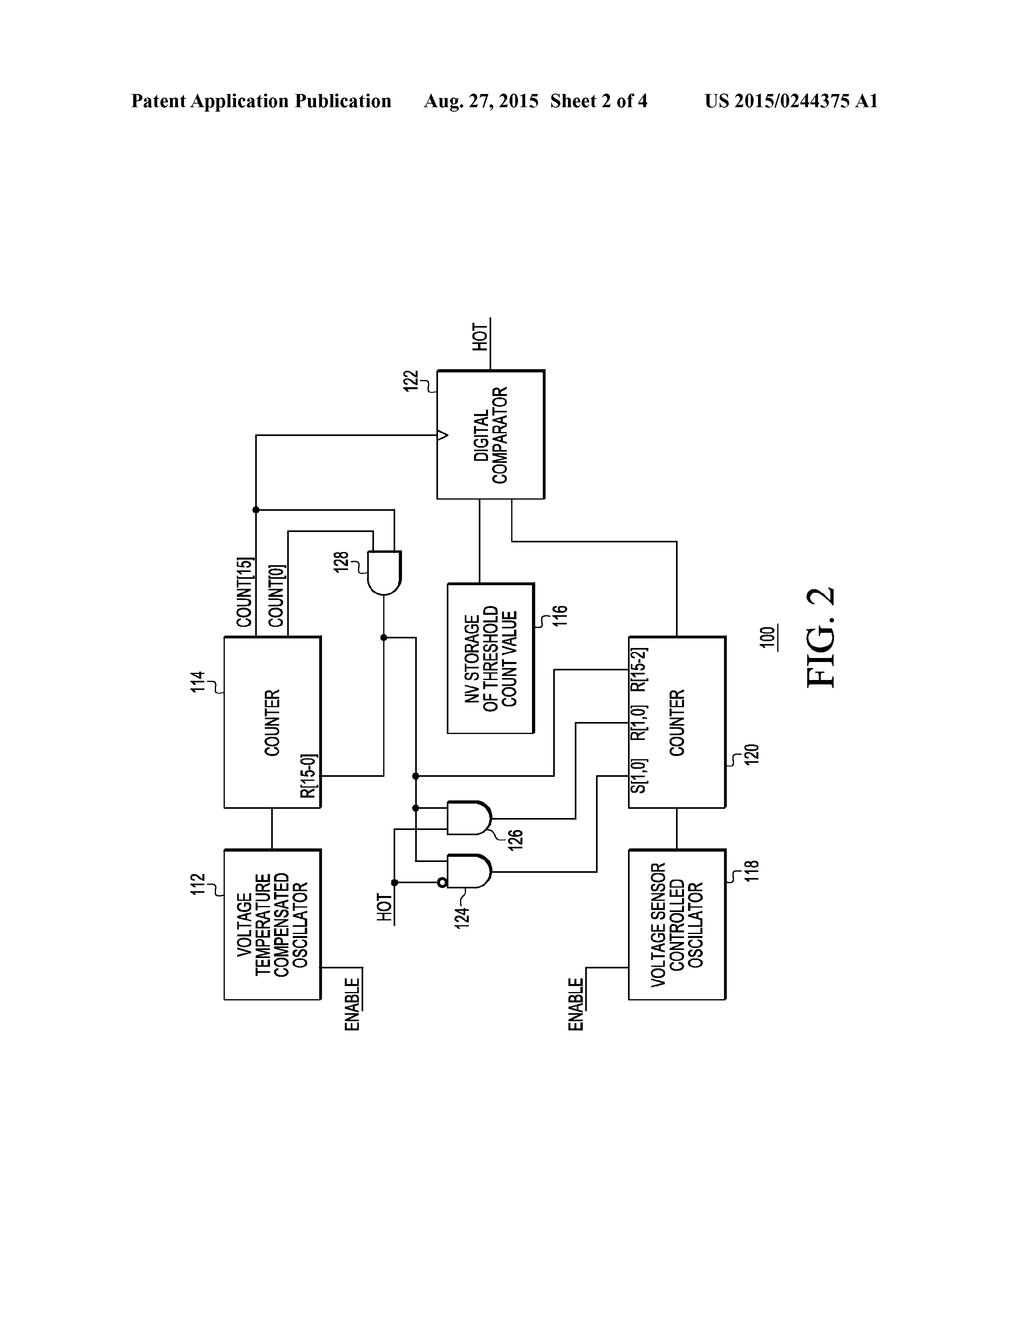 Threshold Fet 10 Hl Schematic Wwwthresholdloverscom Wiring Diagram Circuit Library